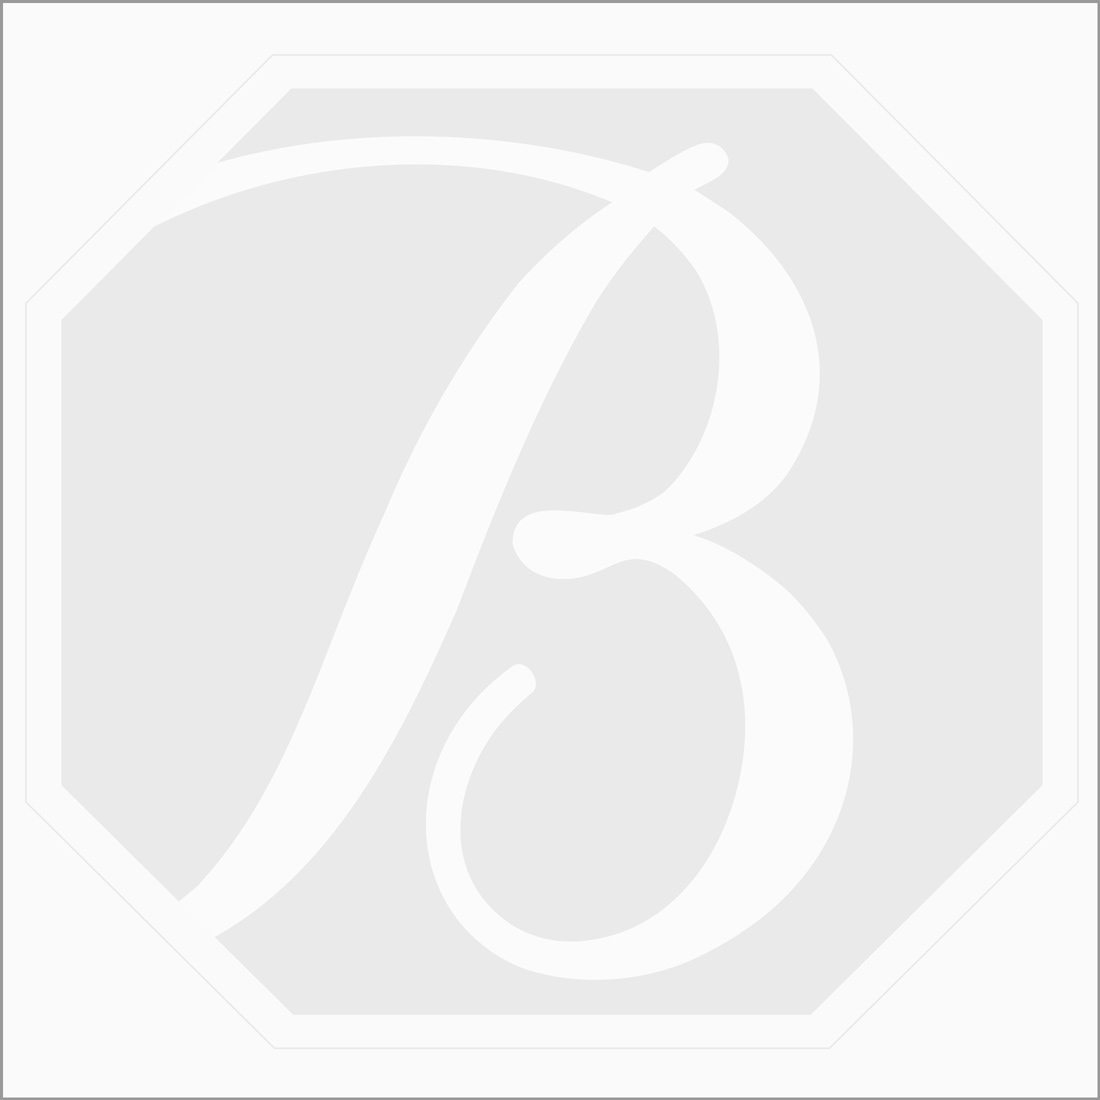 7 Pieces - Medium Tones Multi-Sapphire Rose Cut - 12 x 9.50 mm to 14 x 10.50 mm - 55.5 carats (MSRC1315)